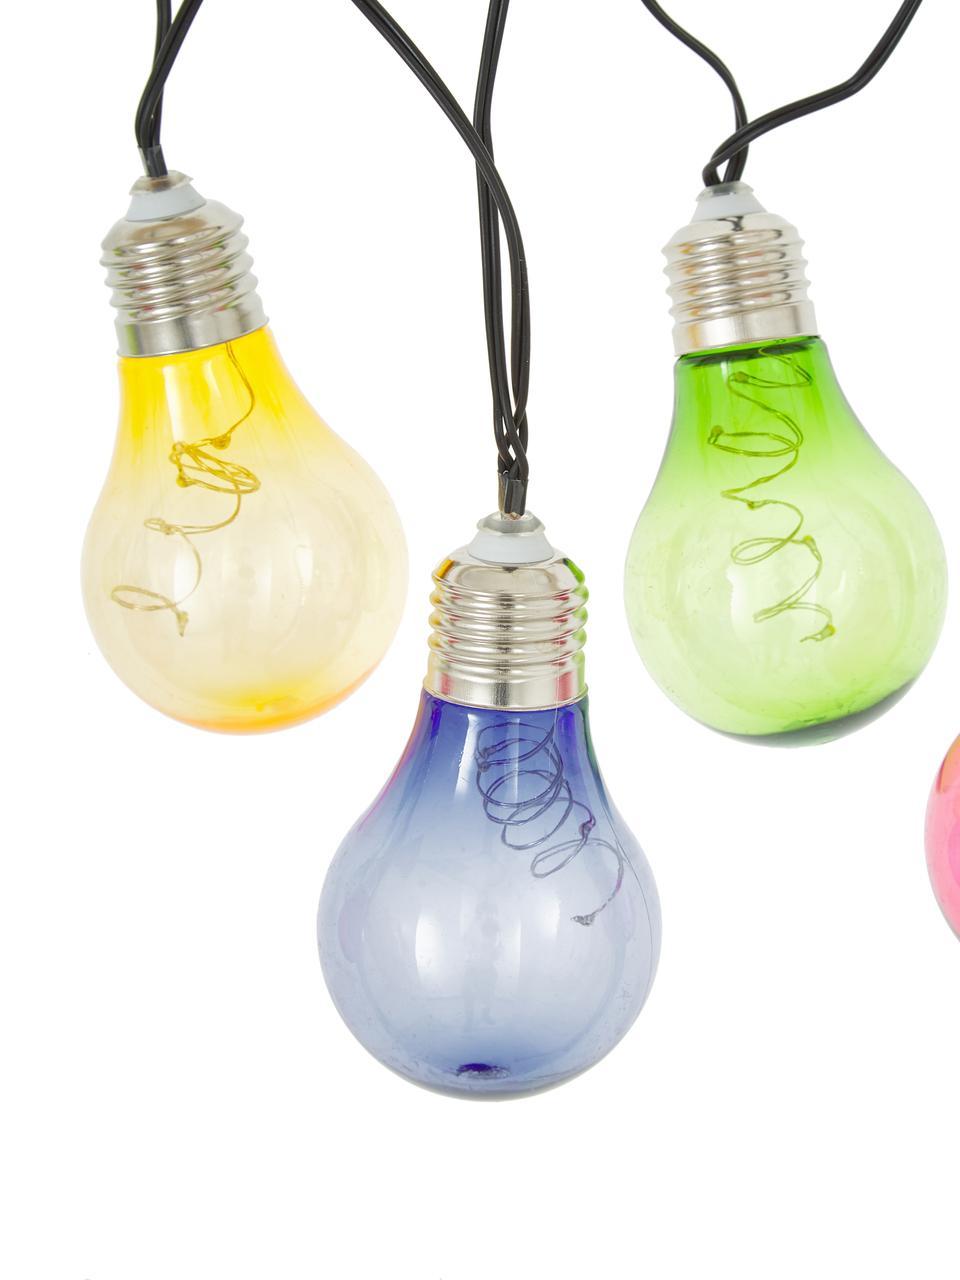 LED-Lichterkette Glow, 150 cm, Merhfarbig, L 190 cm